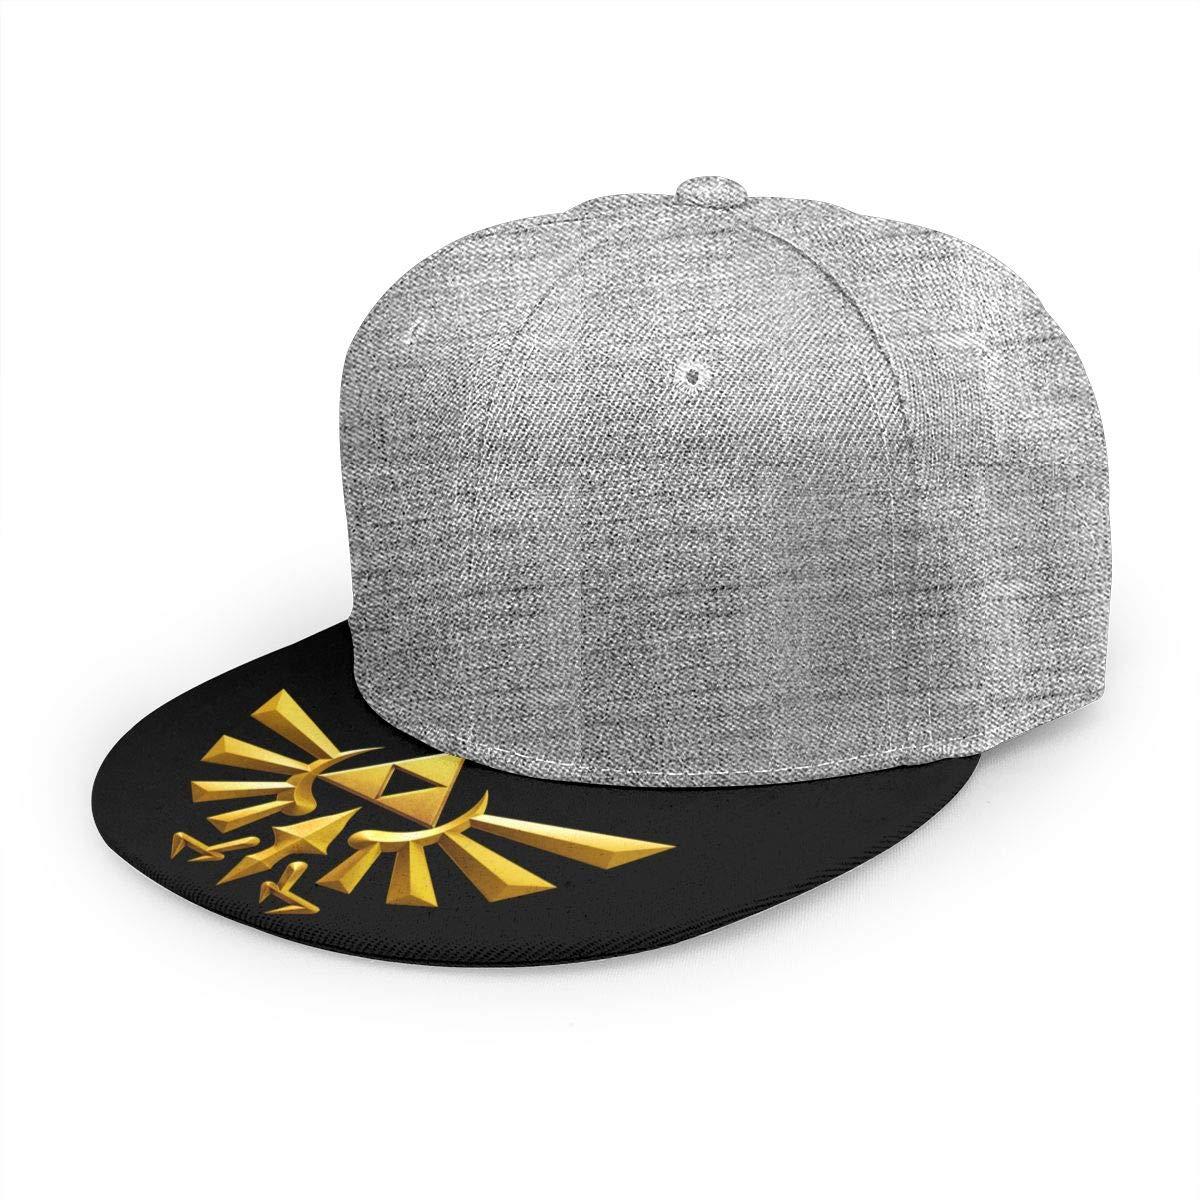 Adjustable Women Men The-Legend-of-Zelda Print Baseball Cap Flat Brim Cap Hats Hip Hop Snapback Sun Hat Boys Girls Gray by Apolonia